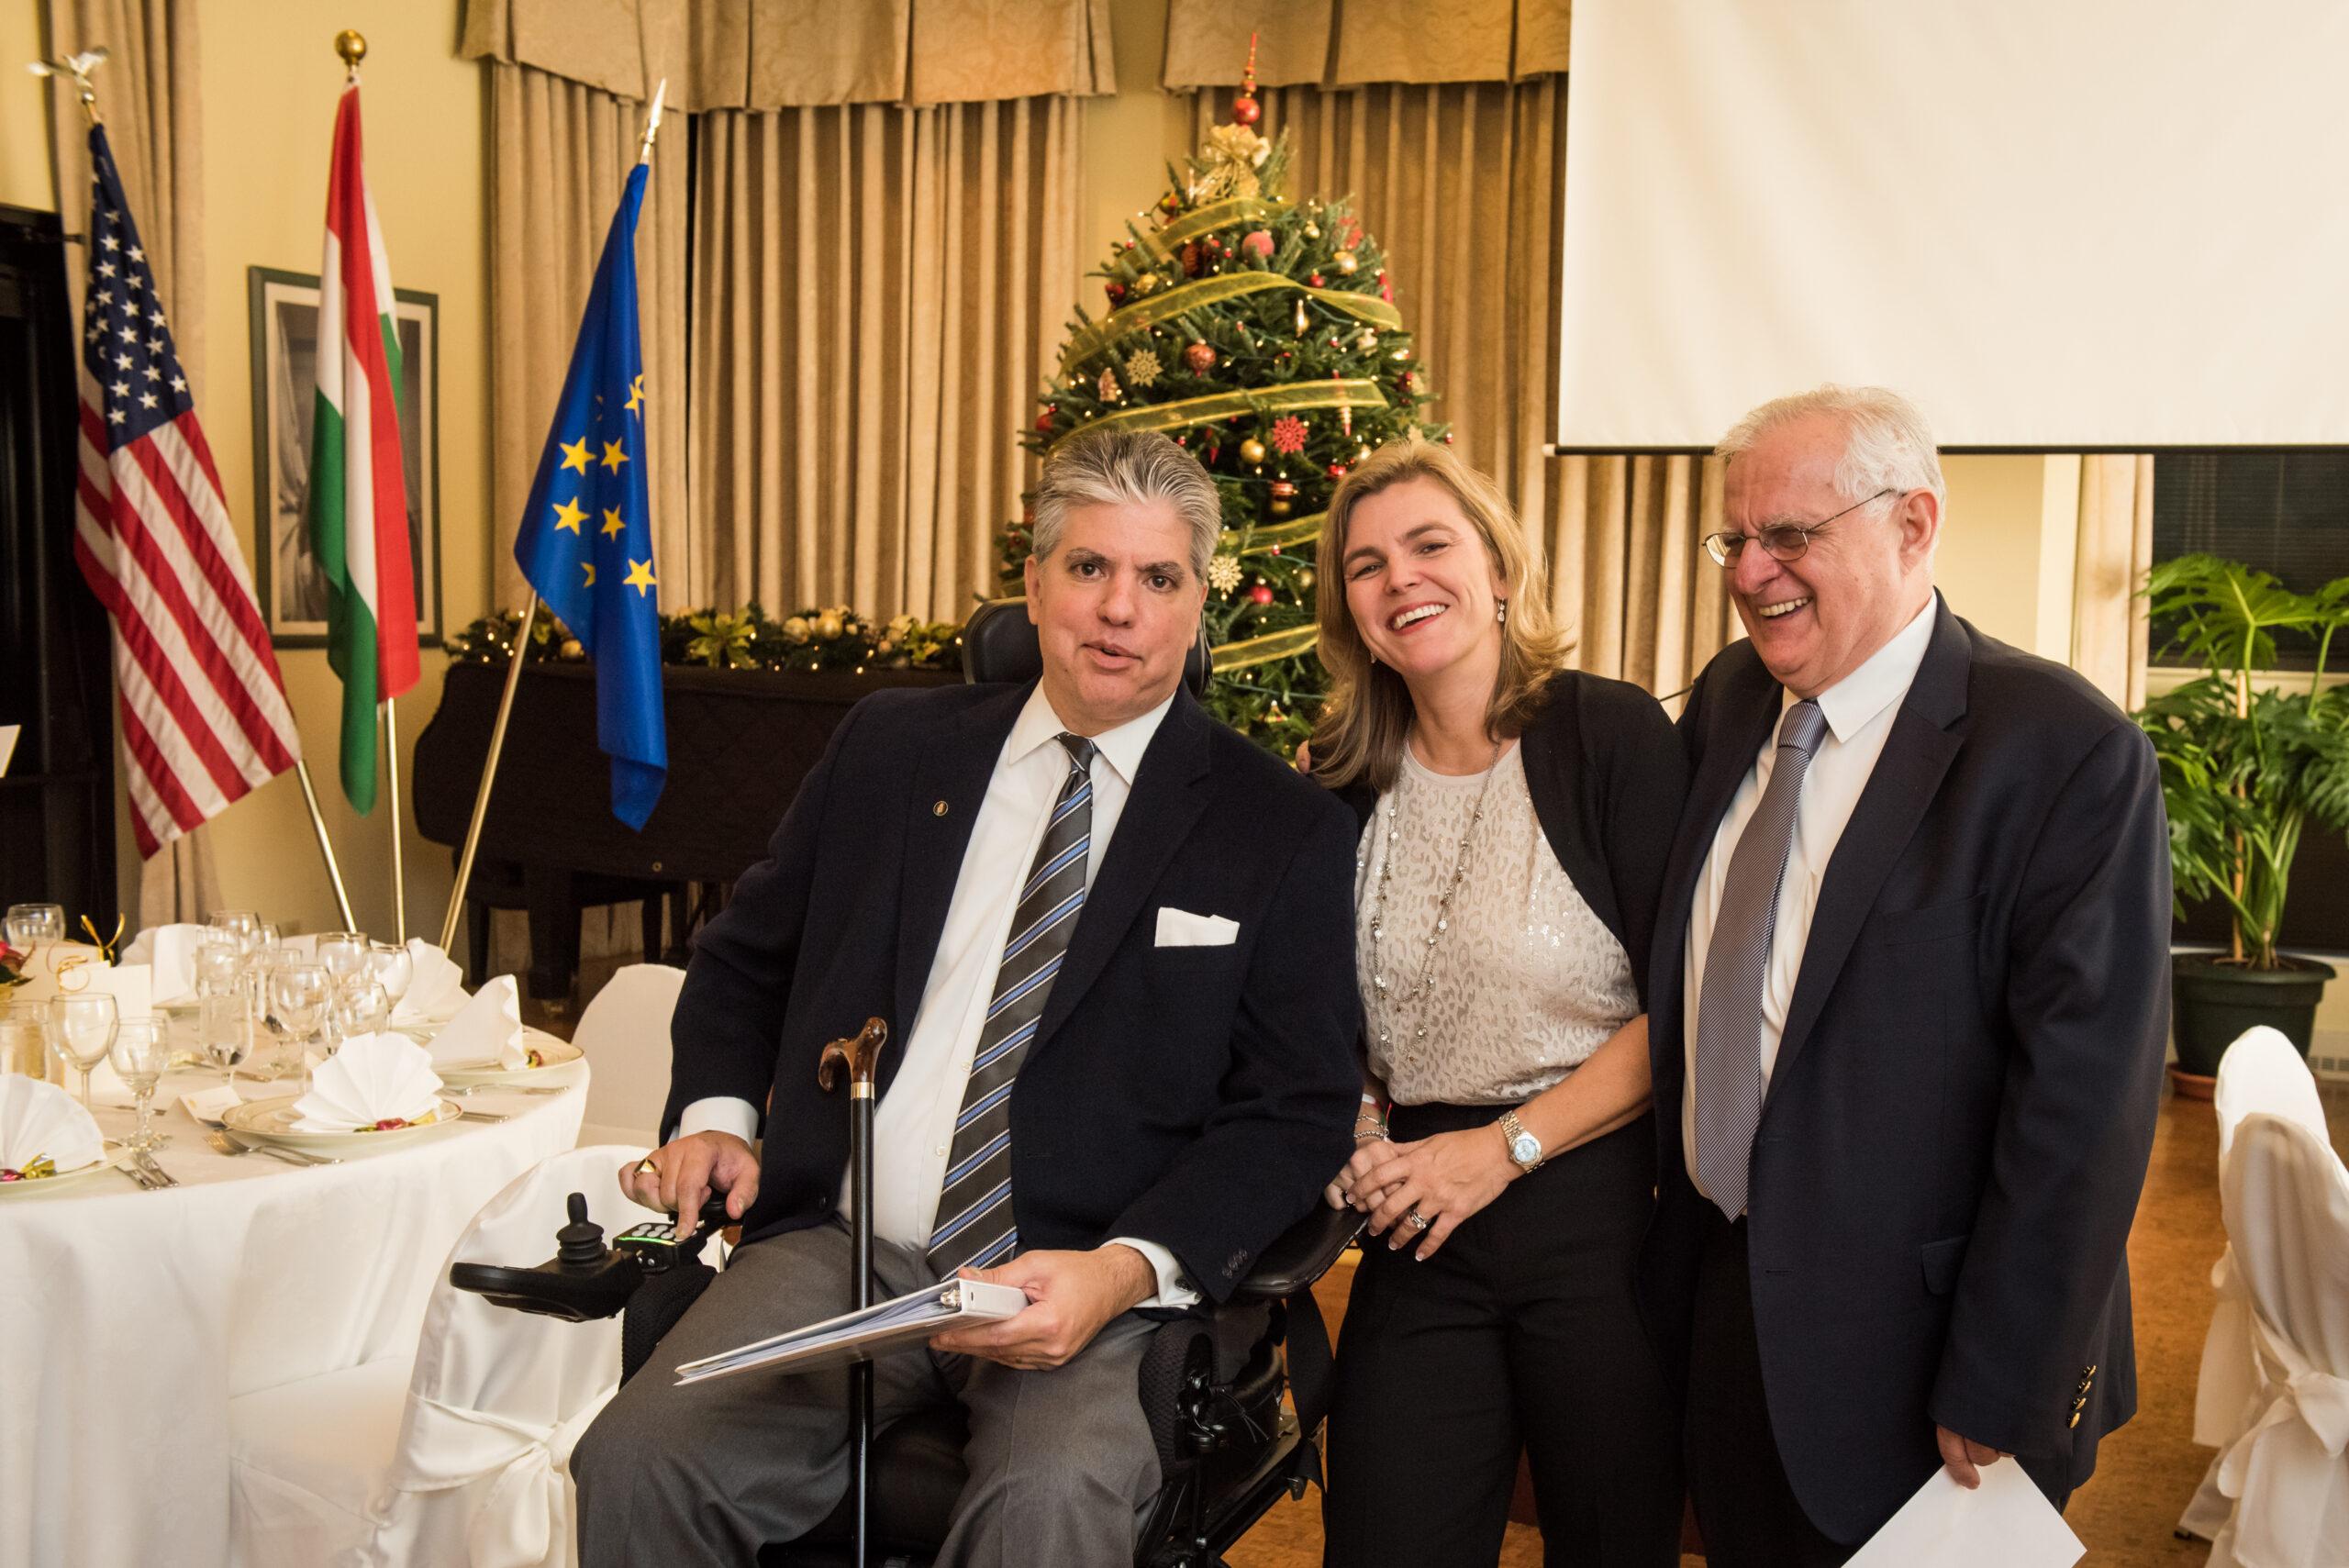 Mr. Maximilian N. Teleki, Mrs. Andrea Lauer Rice and Mr. Zsolt Szekeres